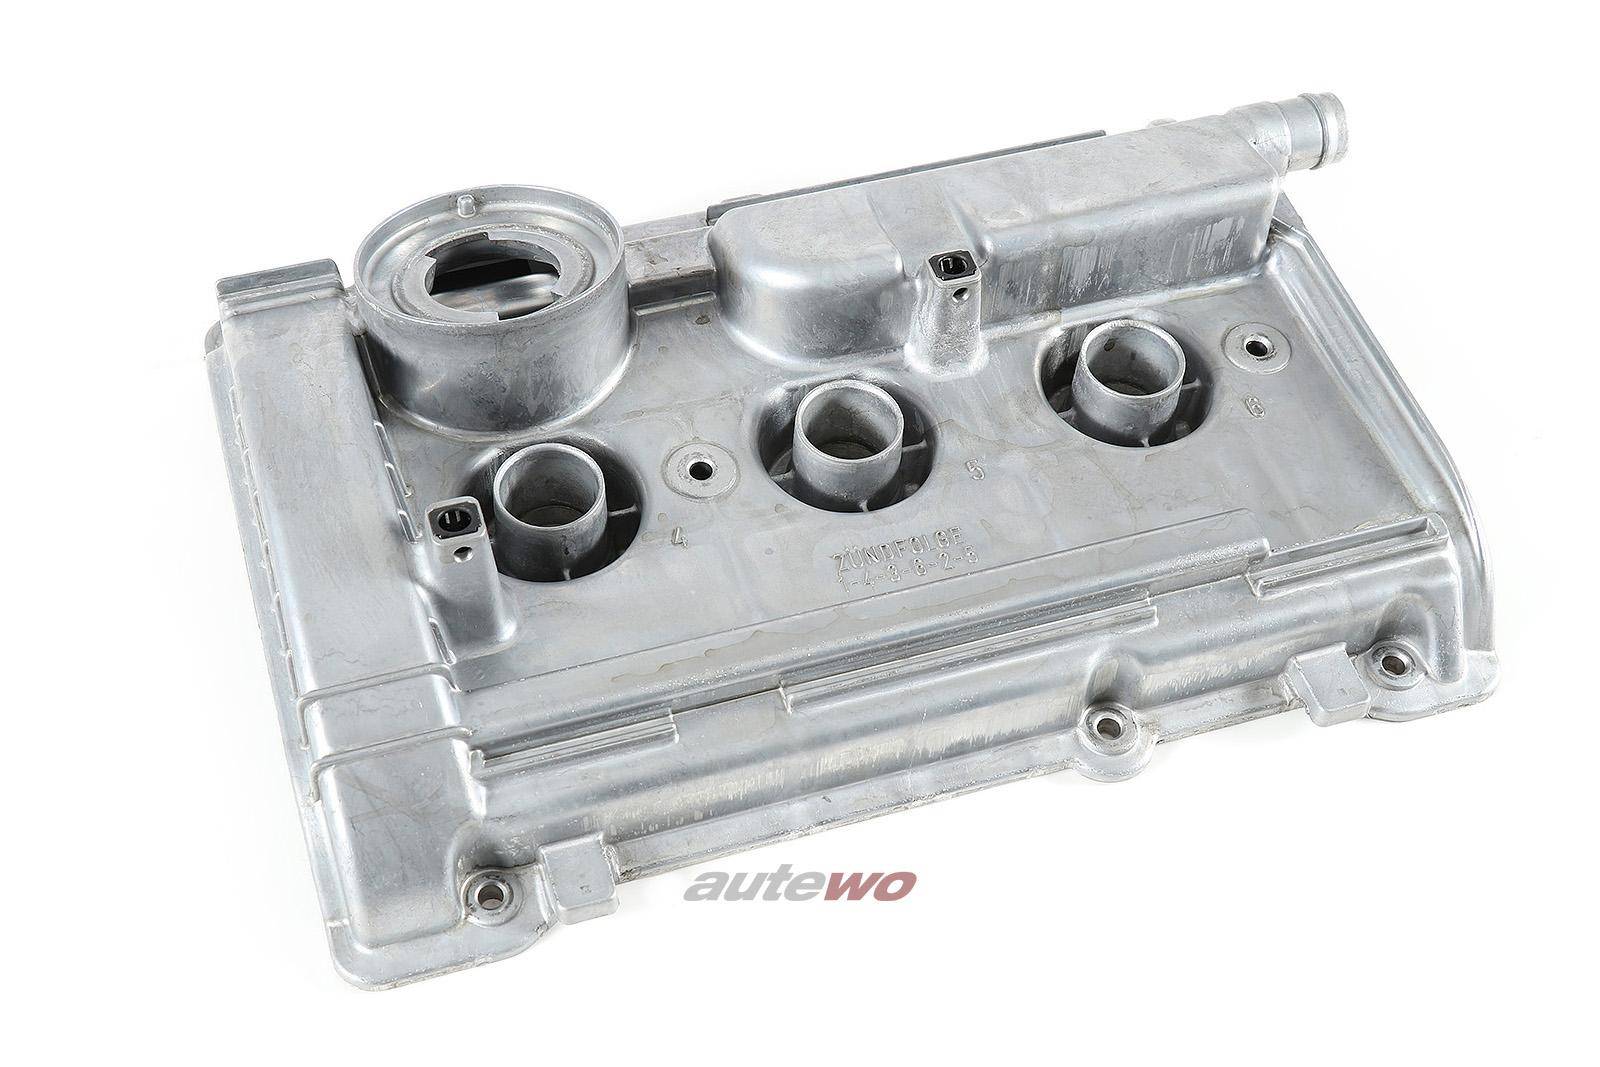 078103471R NEU Audi/VW A4 B5/A6 4B/A8 D2/Passat 3B V6 Ventildeckel Links